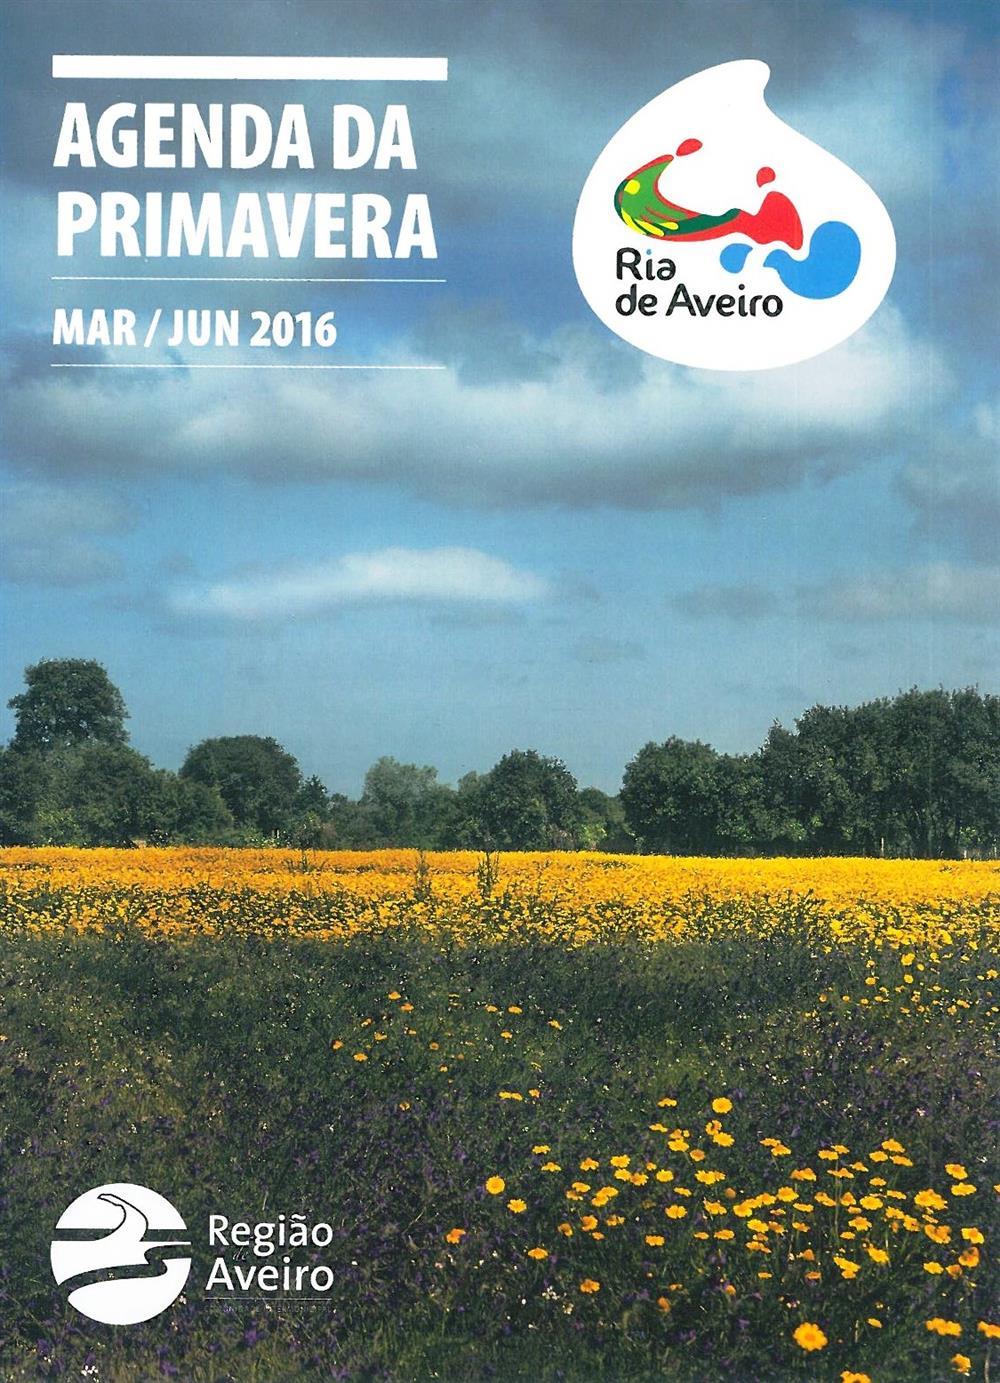 RA-Agenda-mar.'16-capa-Ria de Aveiro : Agenda da Primavera.jpg